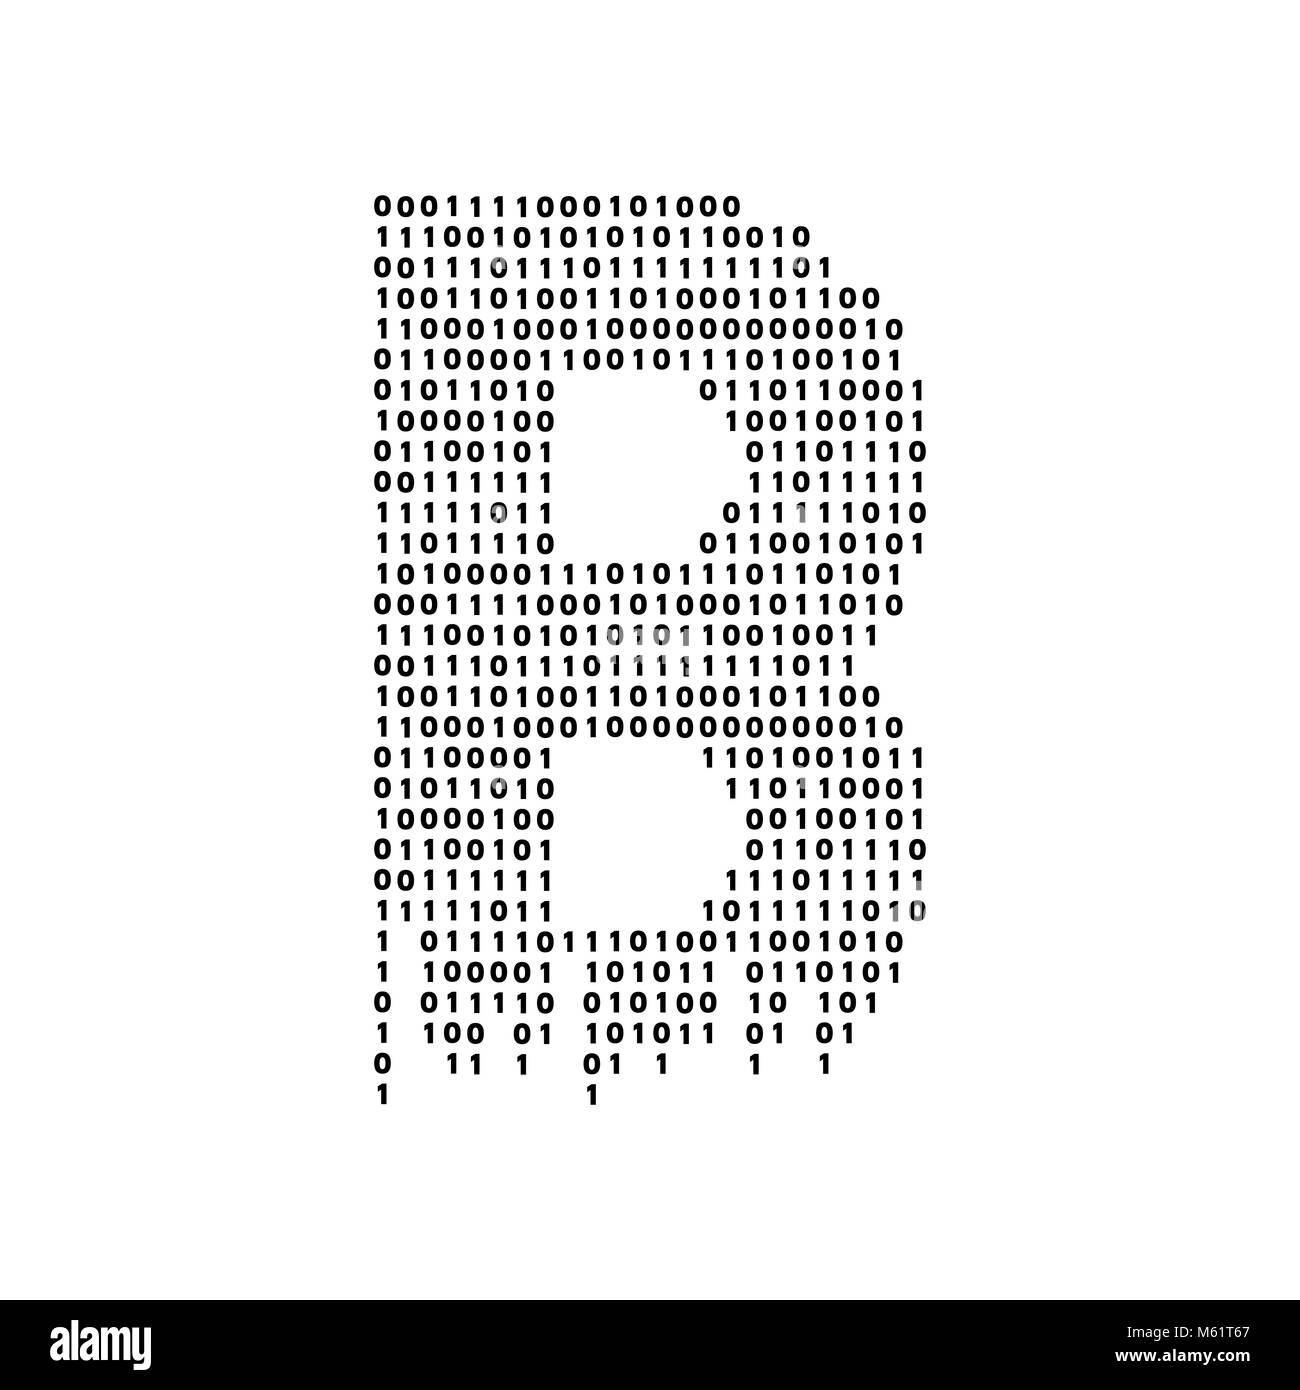 Abstract Vector Illustration. La technologie Bitcoin Photo Stock